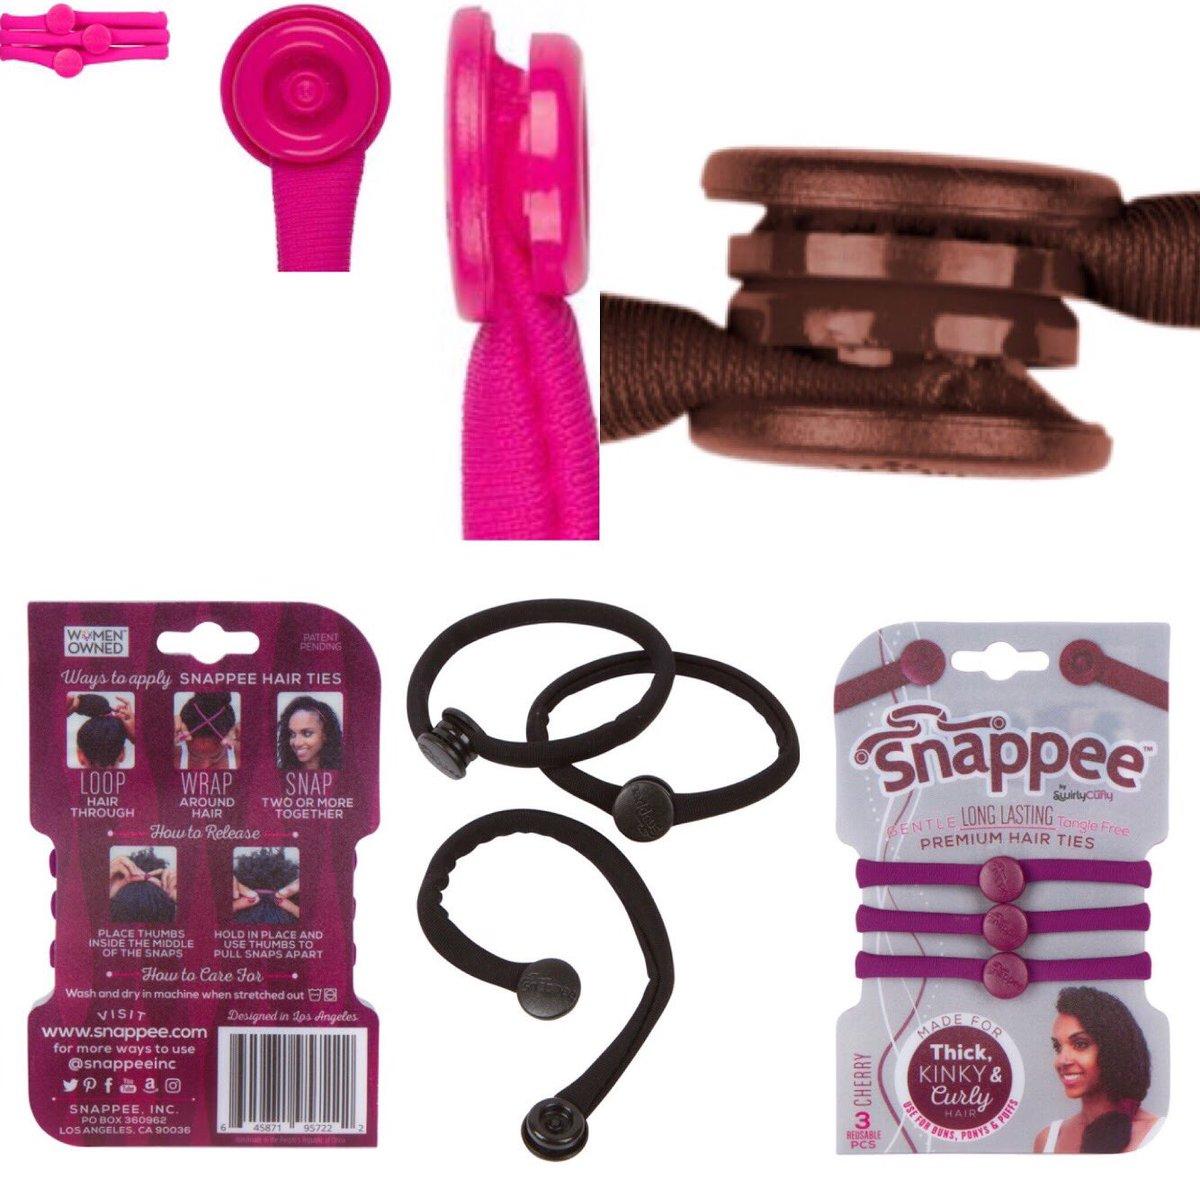 snappee  hair  haircare  hairstyle  hairstyles  natural  naturalhair   naturalista  curlyhair  teamnaturalpic.twitter.com UYp9FEaZQb 04d8f727503